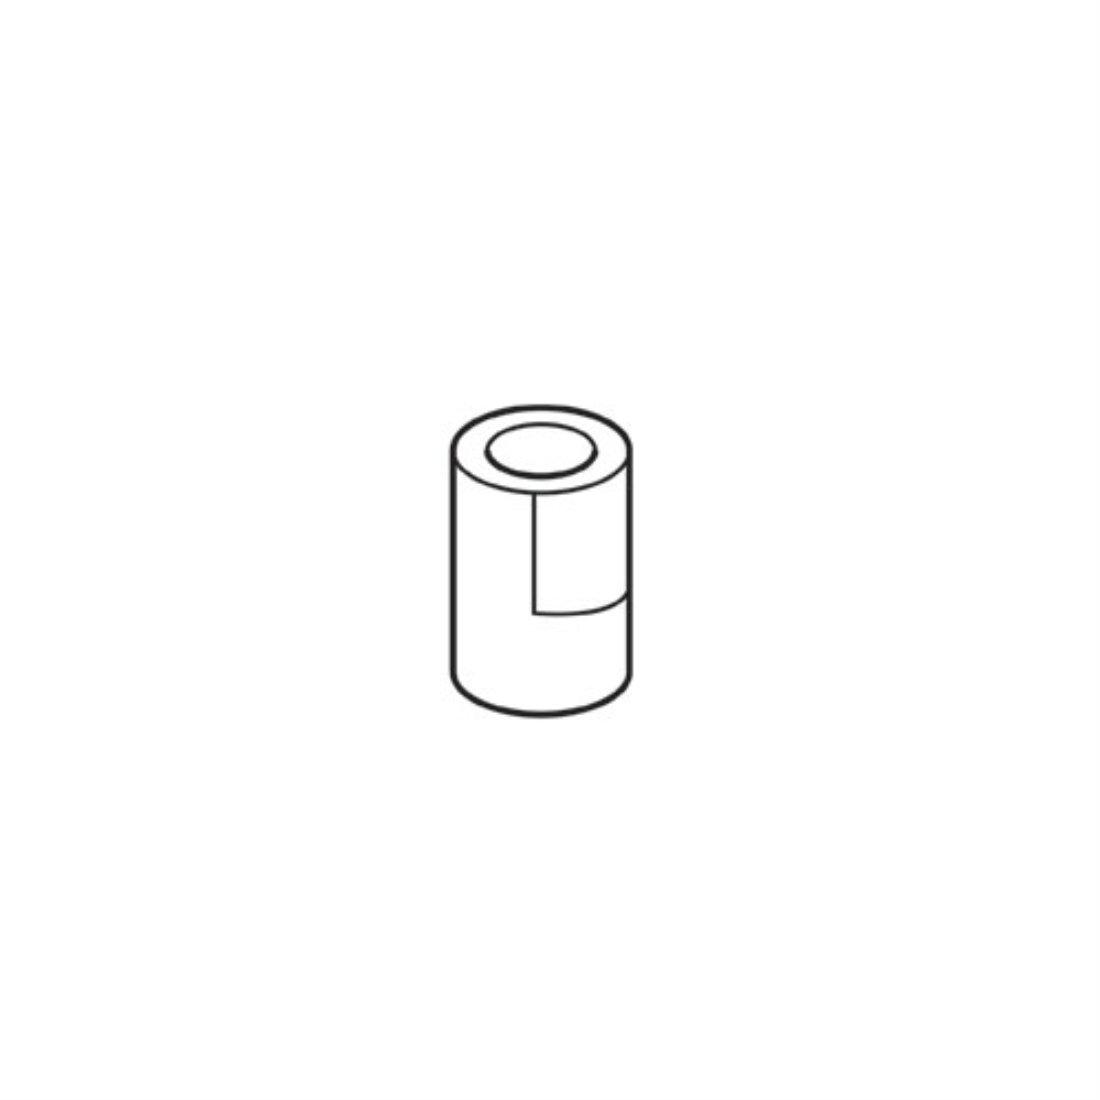 Trend - Barrel nut for Stairjig 1 off - WP-SJ/06